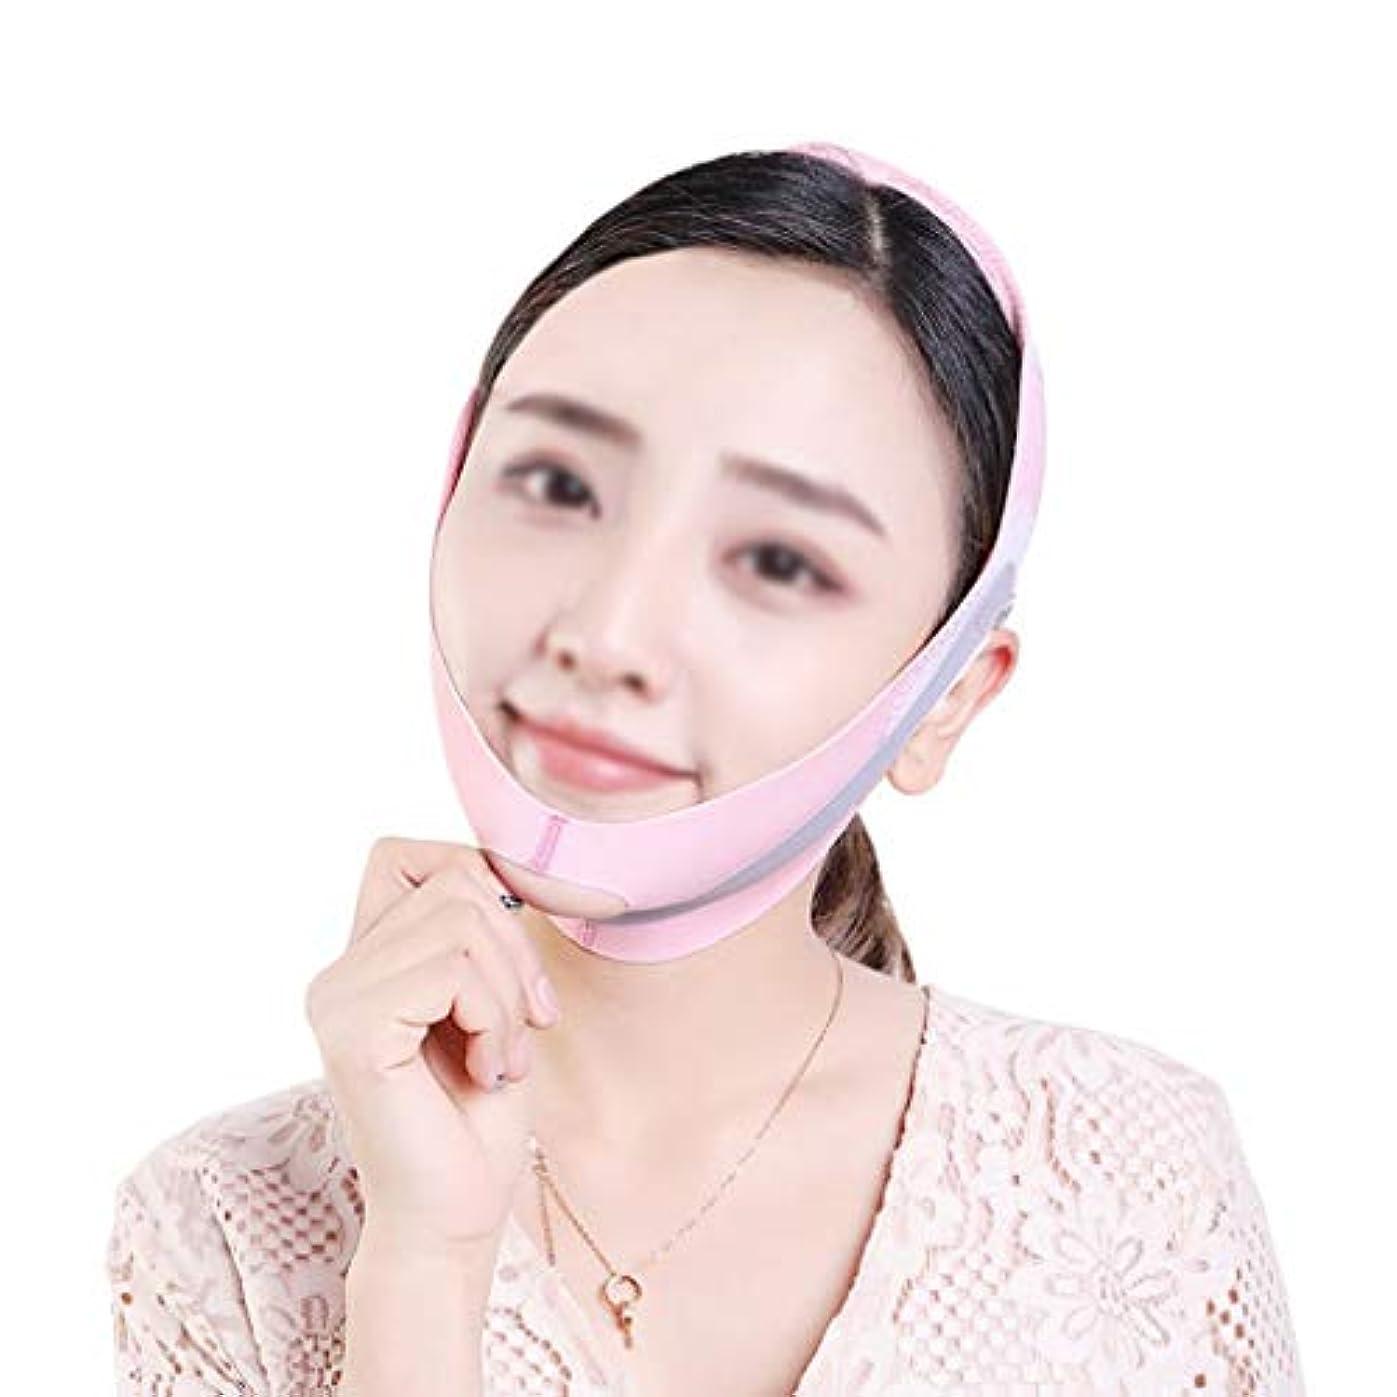 XHLMRMJ フェイスリフティング包帯、フェイスリフティングに適して、フェイシャルスキンを持ち上げ、二重あごケア減量(フリーサイズ、ピンク)